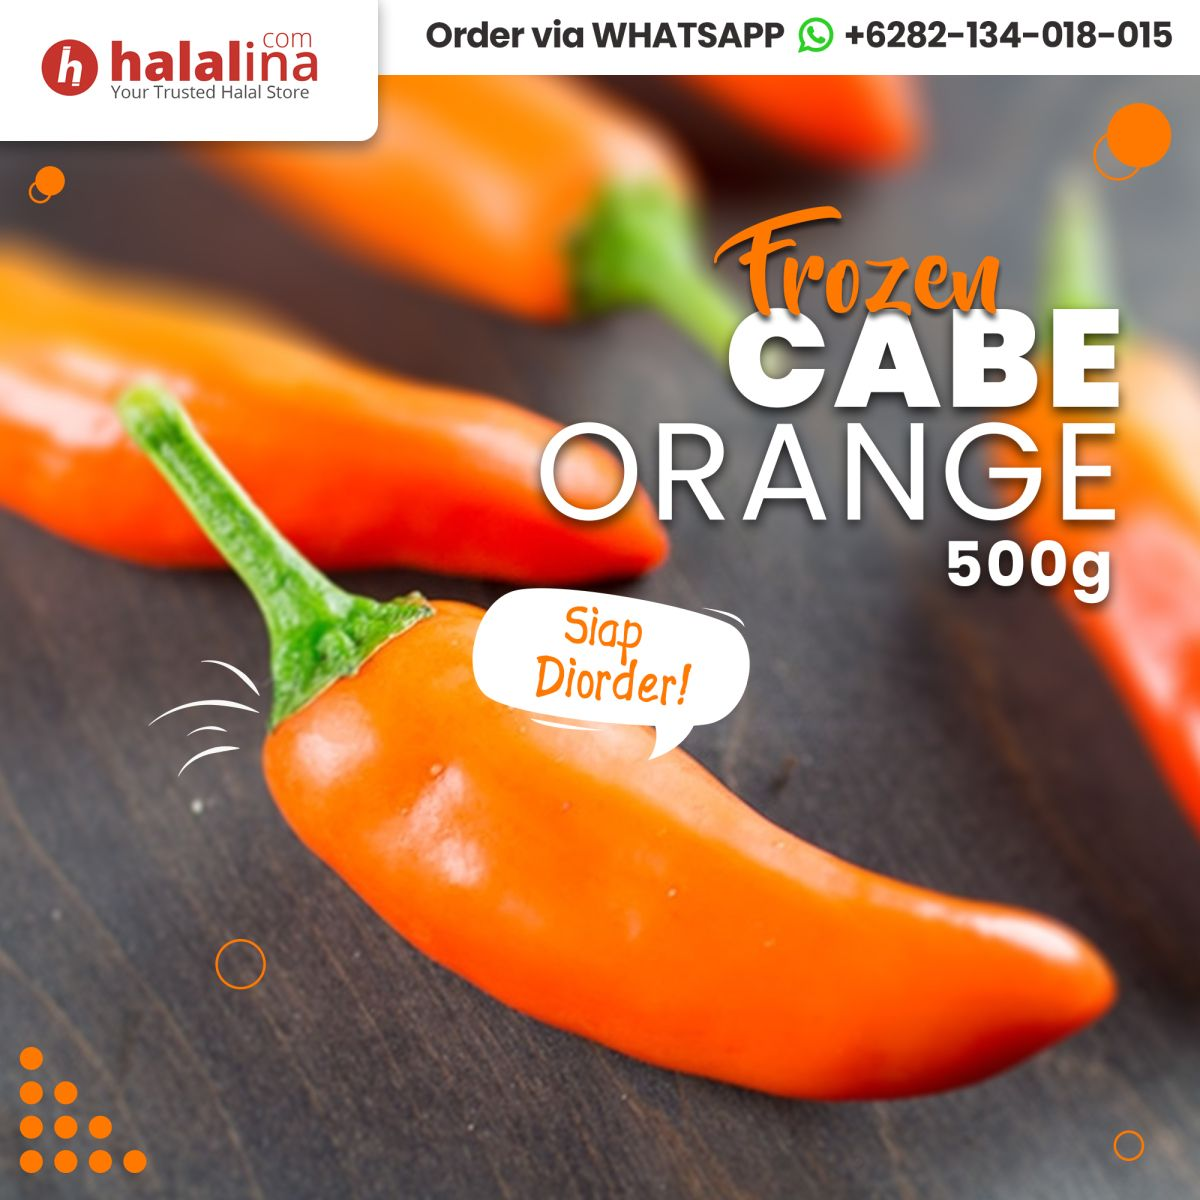 Halalina Phone 62 821 3401 8015 Halal Food In Shinjuku In Japan In 2020 Halal Recipes Japan Food Halal